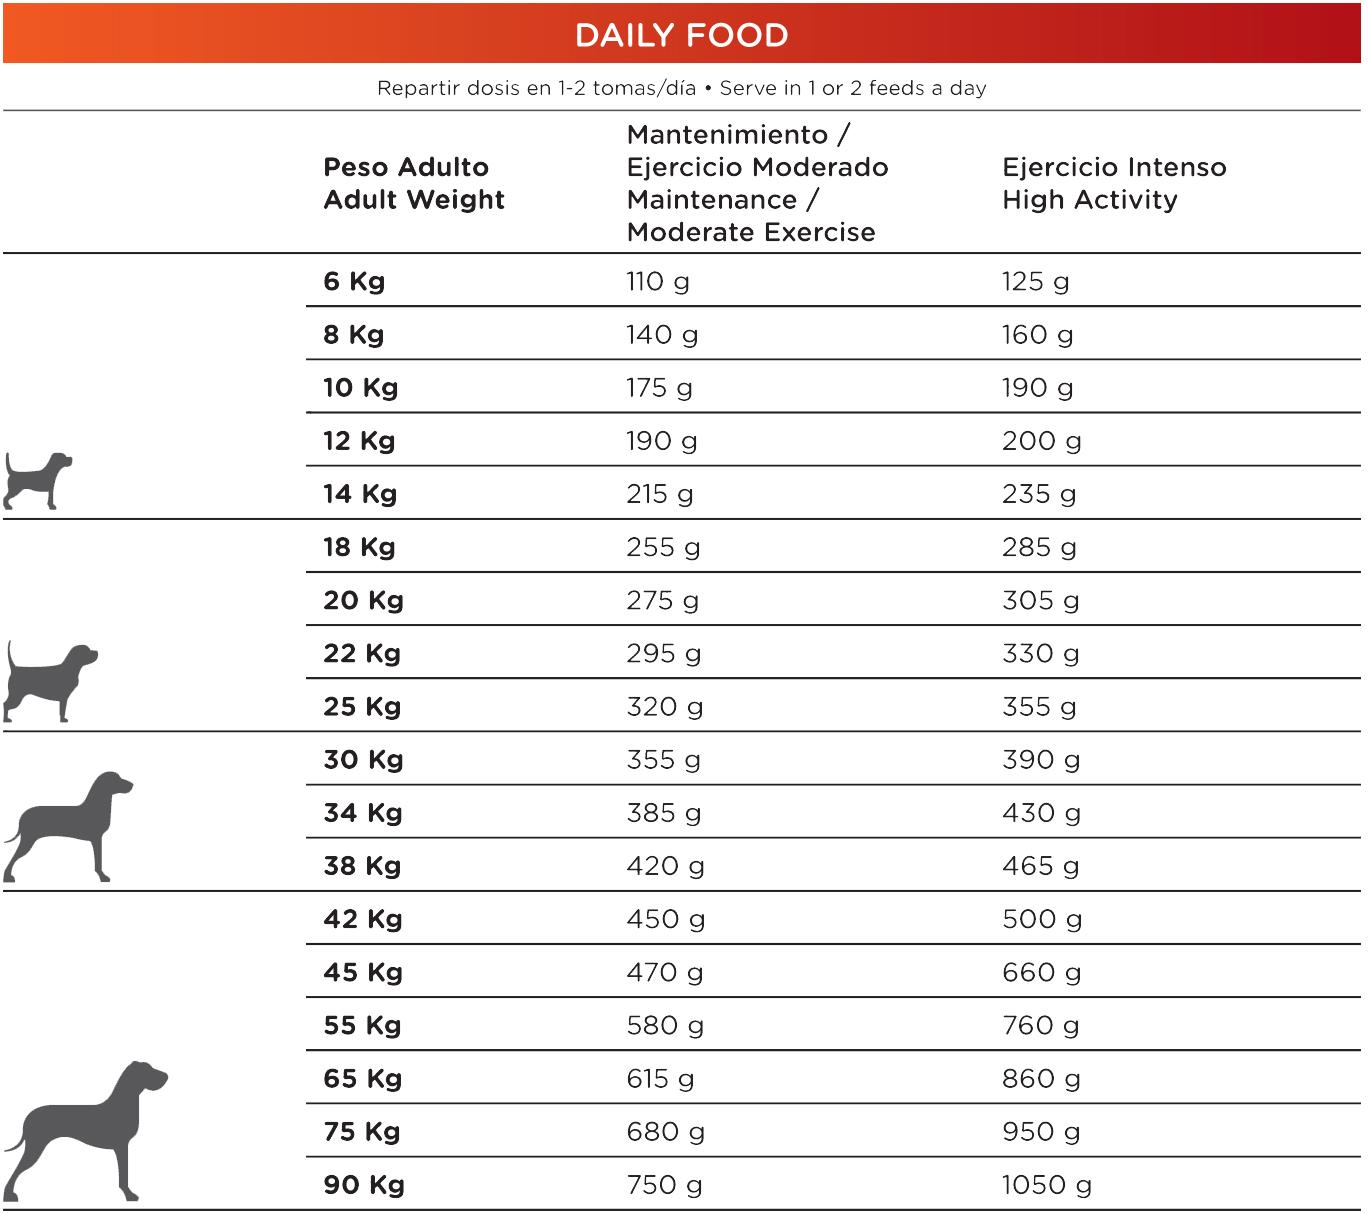 Pienso_Natura_Diet_Daily_Food_Racion_diaria